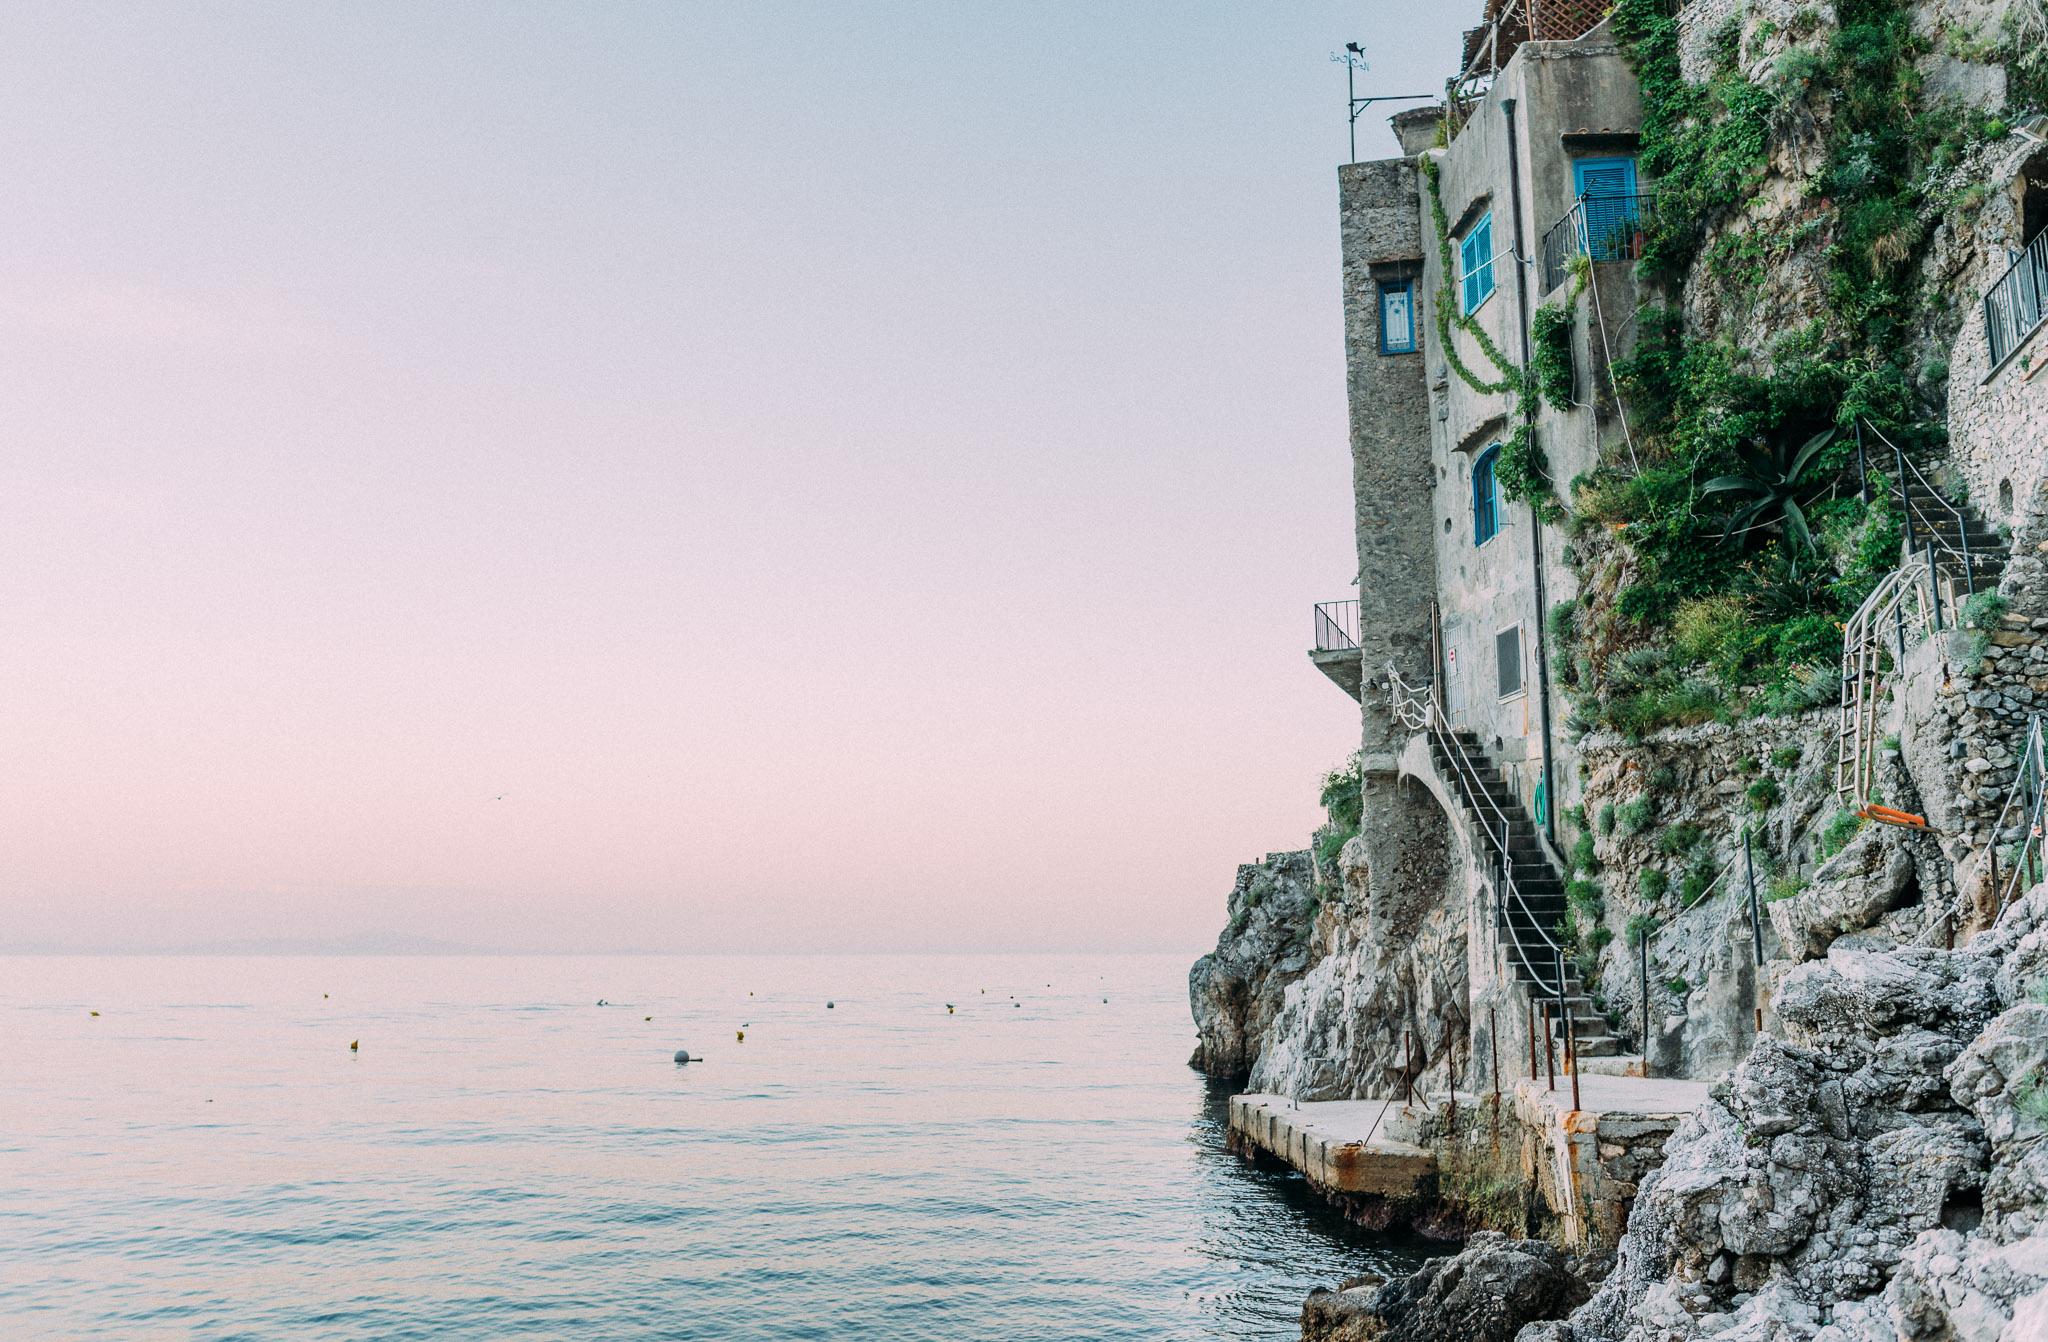 PJ Rankin_Drop in the Ocean_Italy-21.jpg